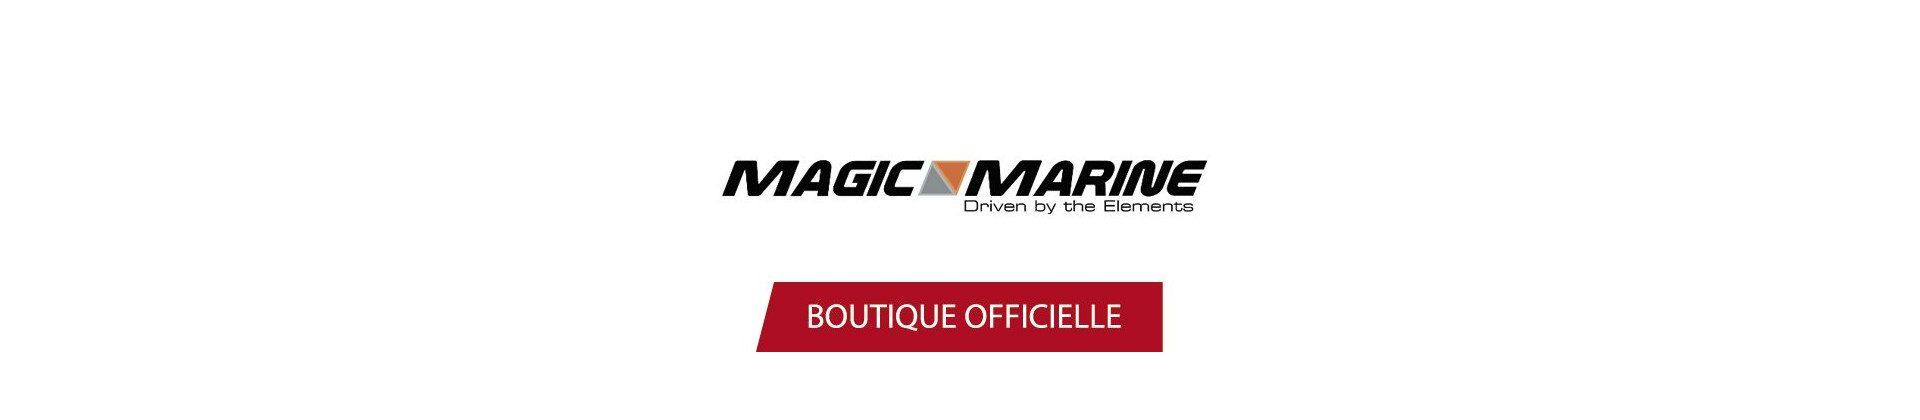 Magic Marine Shop